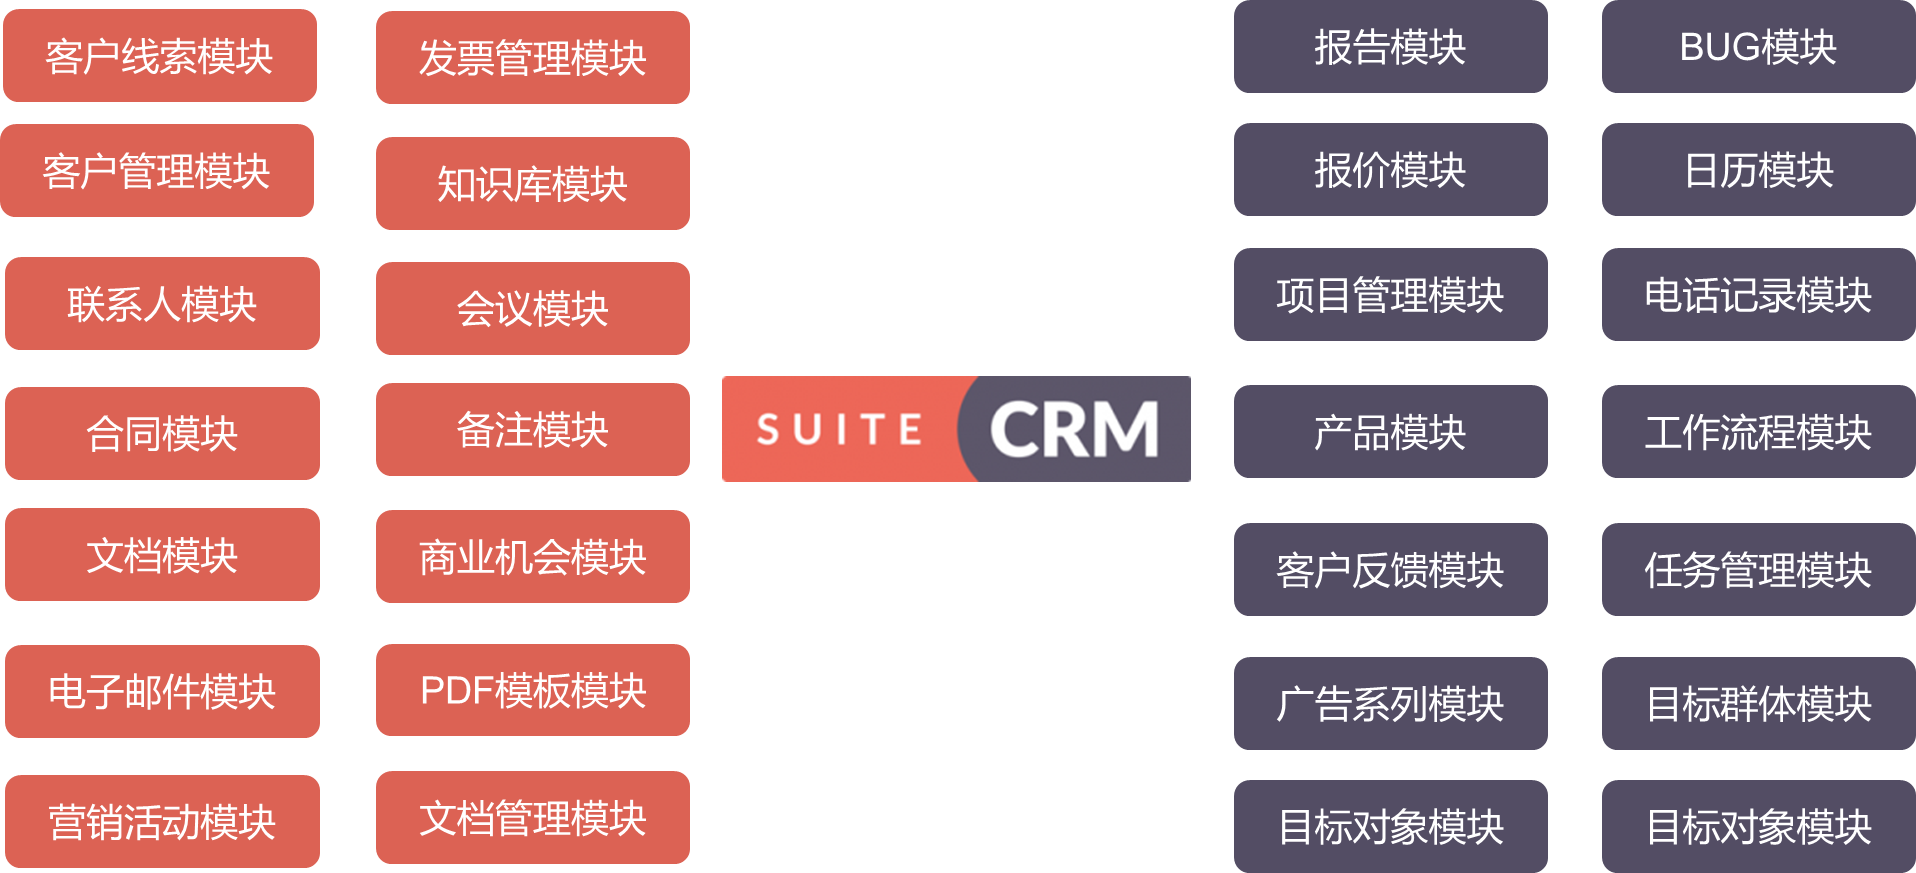 crm系统在线试用,crm下载,crm销售管理系统,crm销售管理系统软件,crm销售系统